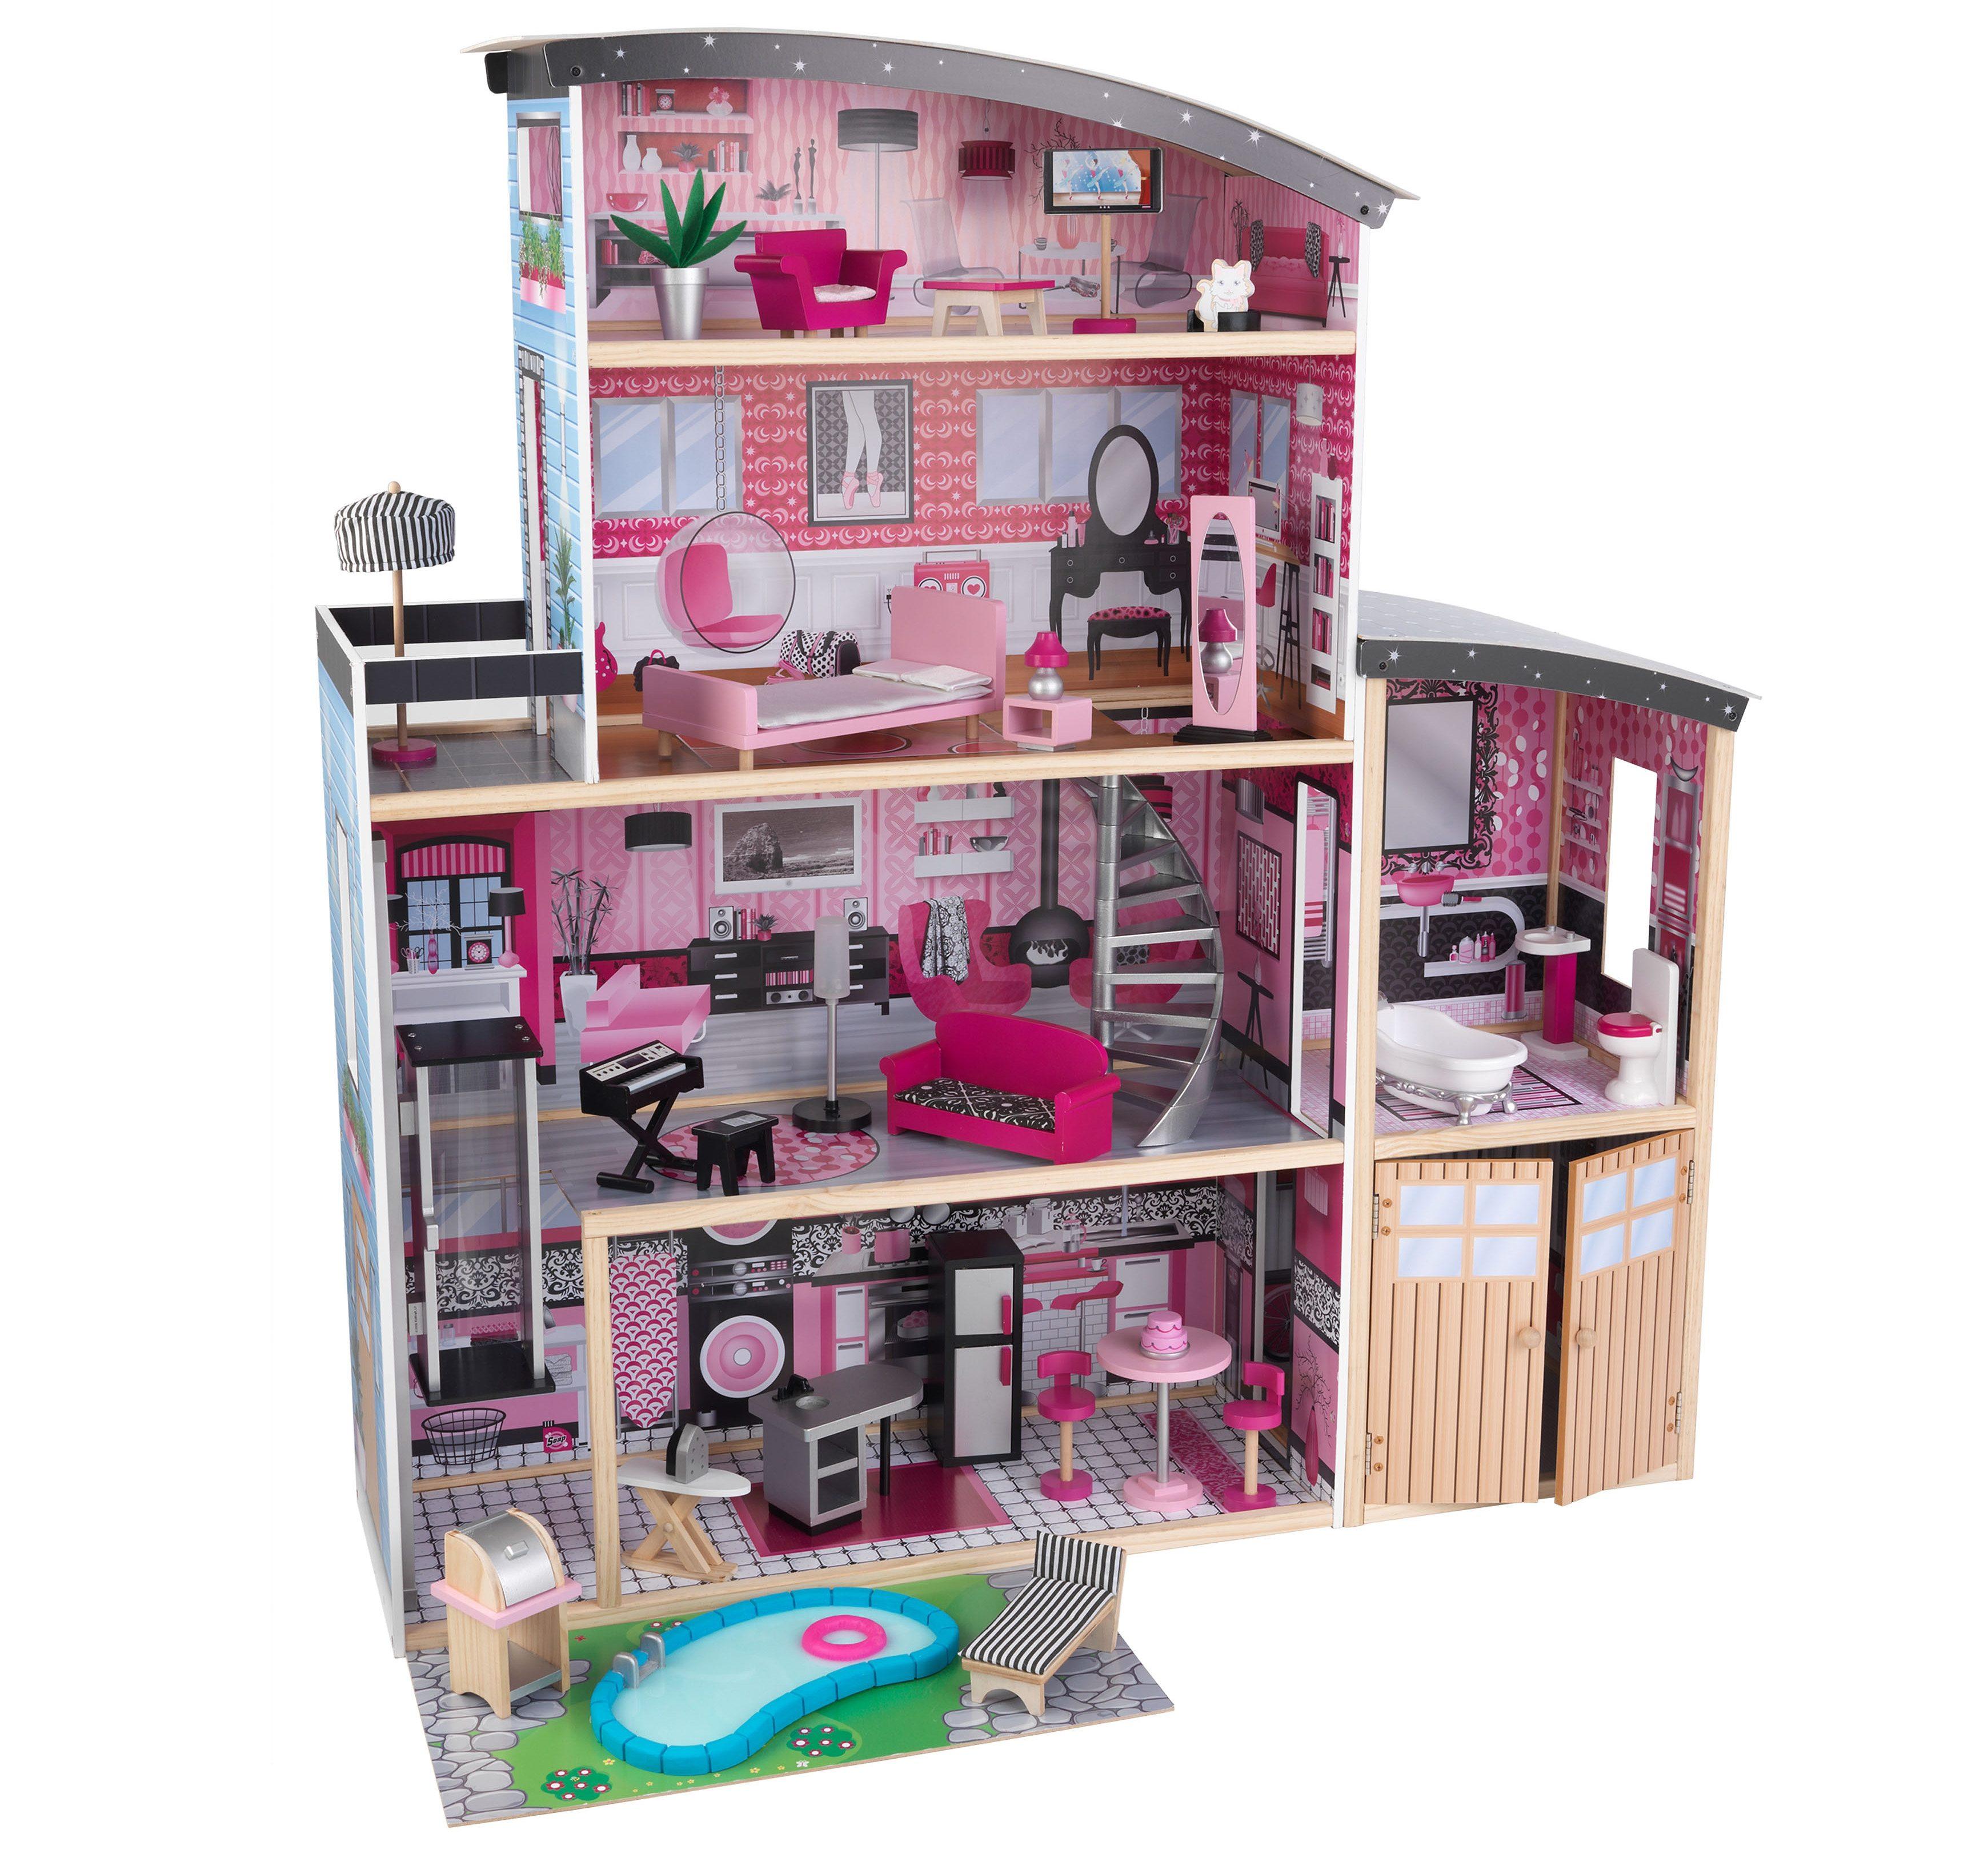 "KidKraft Puppenhaus ""Glitzer Puppen-Villa"" Kindermode/Spielzeug/Puppen/Puppenhaus"